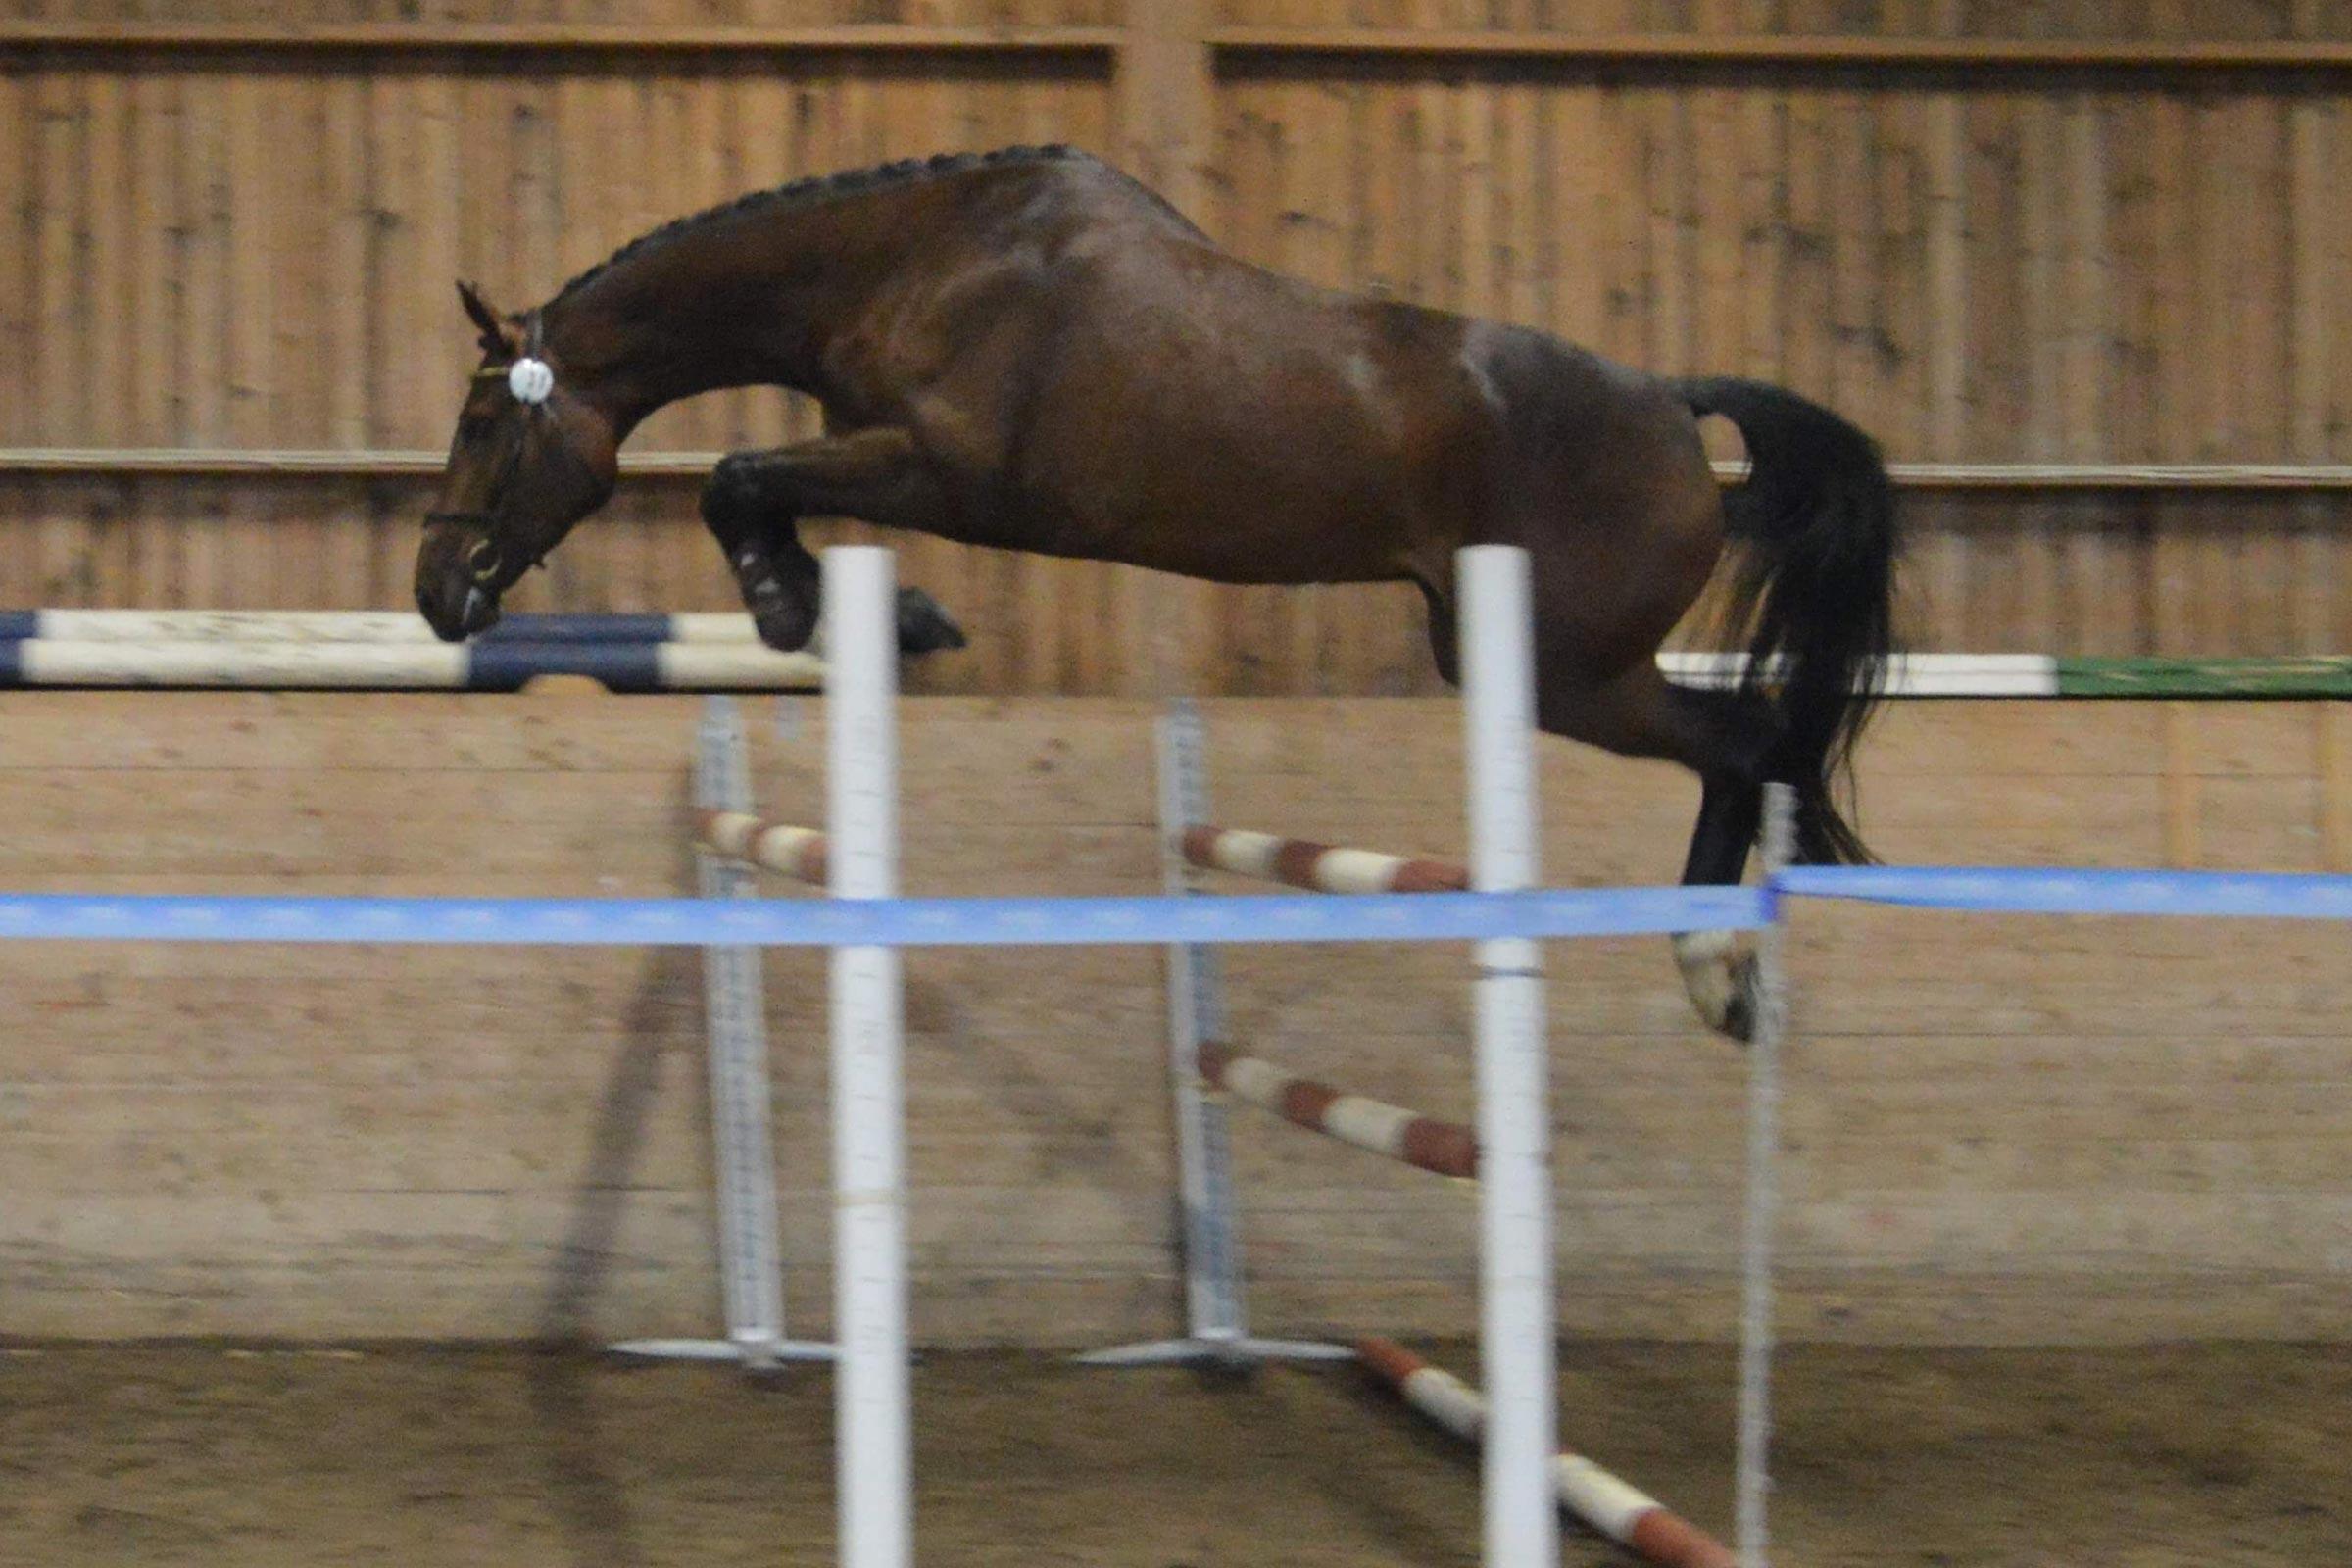 Luna Lou FS SWB sto 169 cm e Balou u Landa e Landor S, uppf/äg Frykens Sporthästar HB. (8,5 8,5) = 83%, diplom